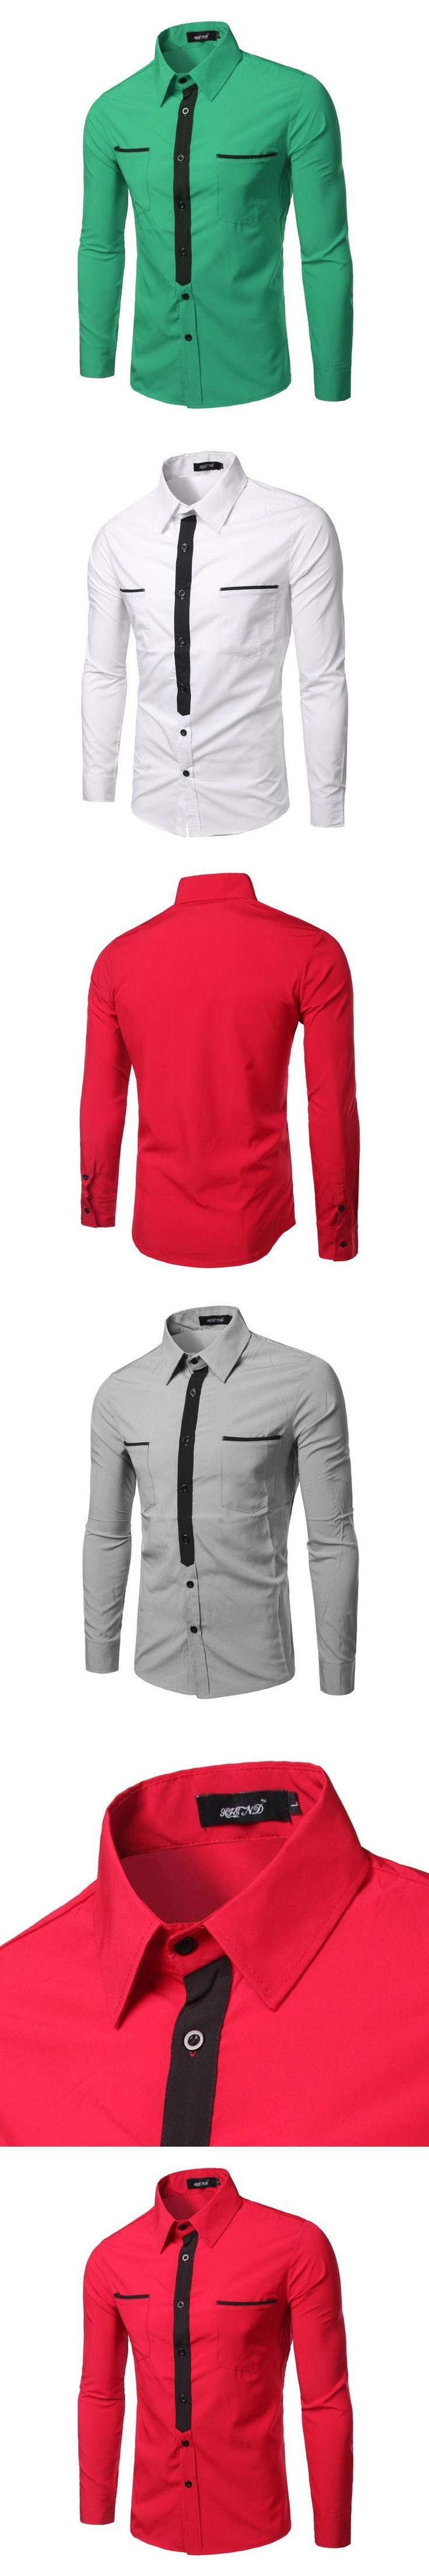 2017 New Fashion Spring Autumn Men Shirts Long Sleeve Style Size M-XXL Full Print Man Slim Fit Shirt Europe Style Men Tops PCA03